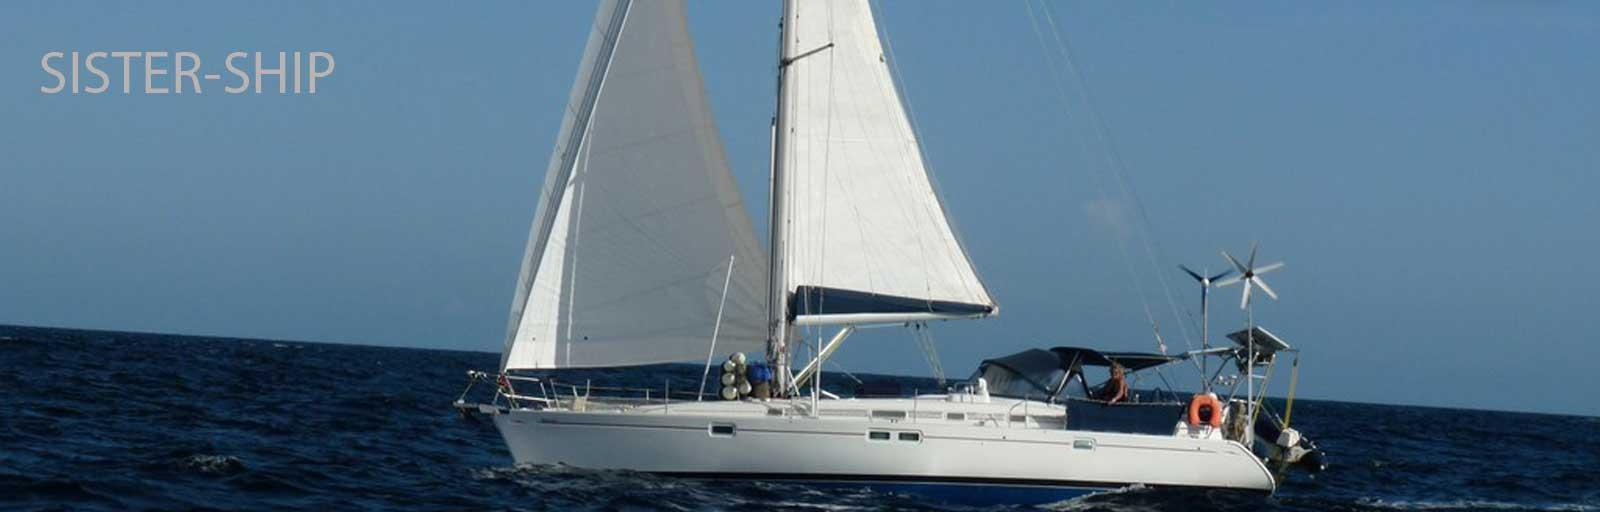 OCEANIS 461 sister-ship PANO